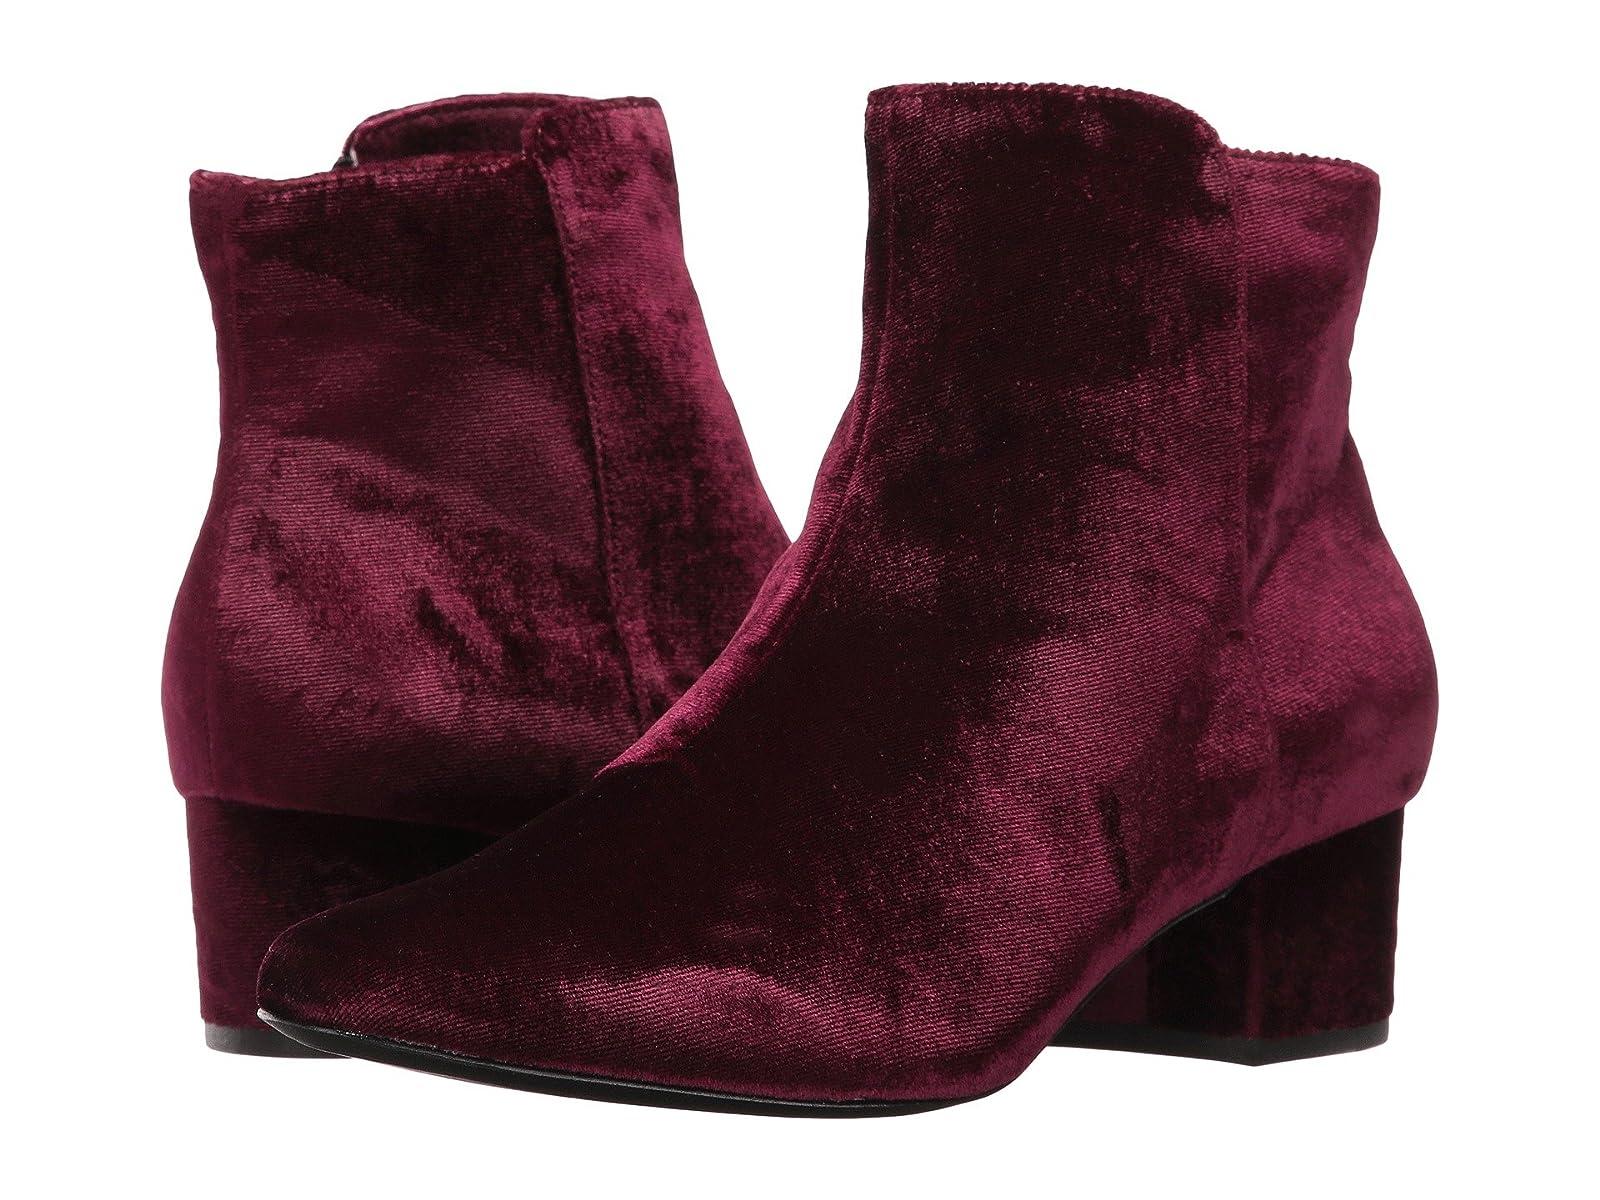 Joie FenllieCheap and distinctive eye-catching shoes